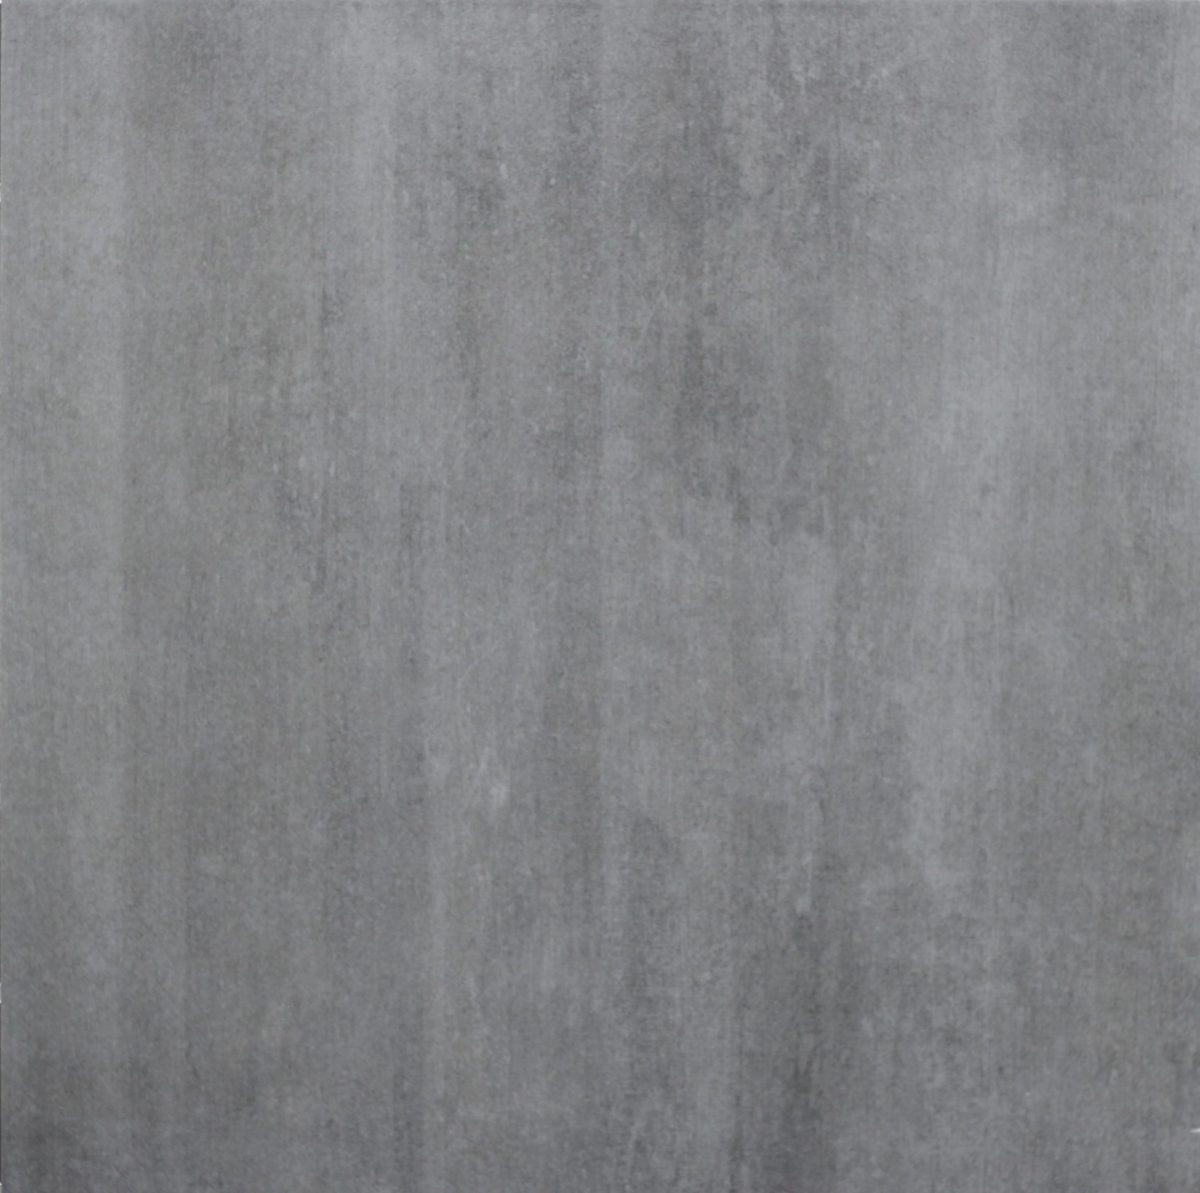 A WOODCRETE NCIA CHARCOAL EXTERNAL 450x450mm